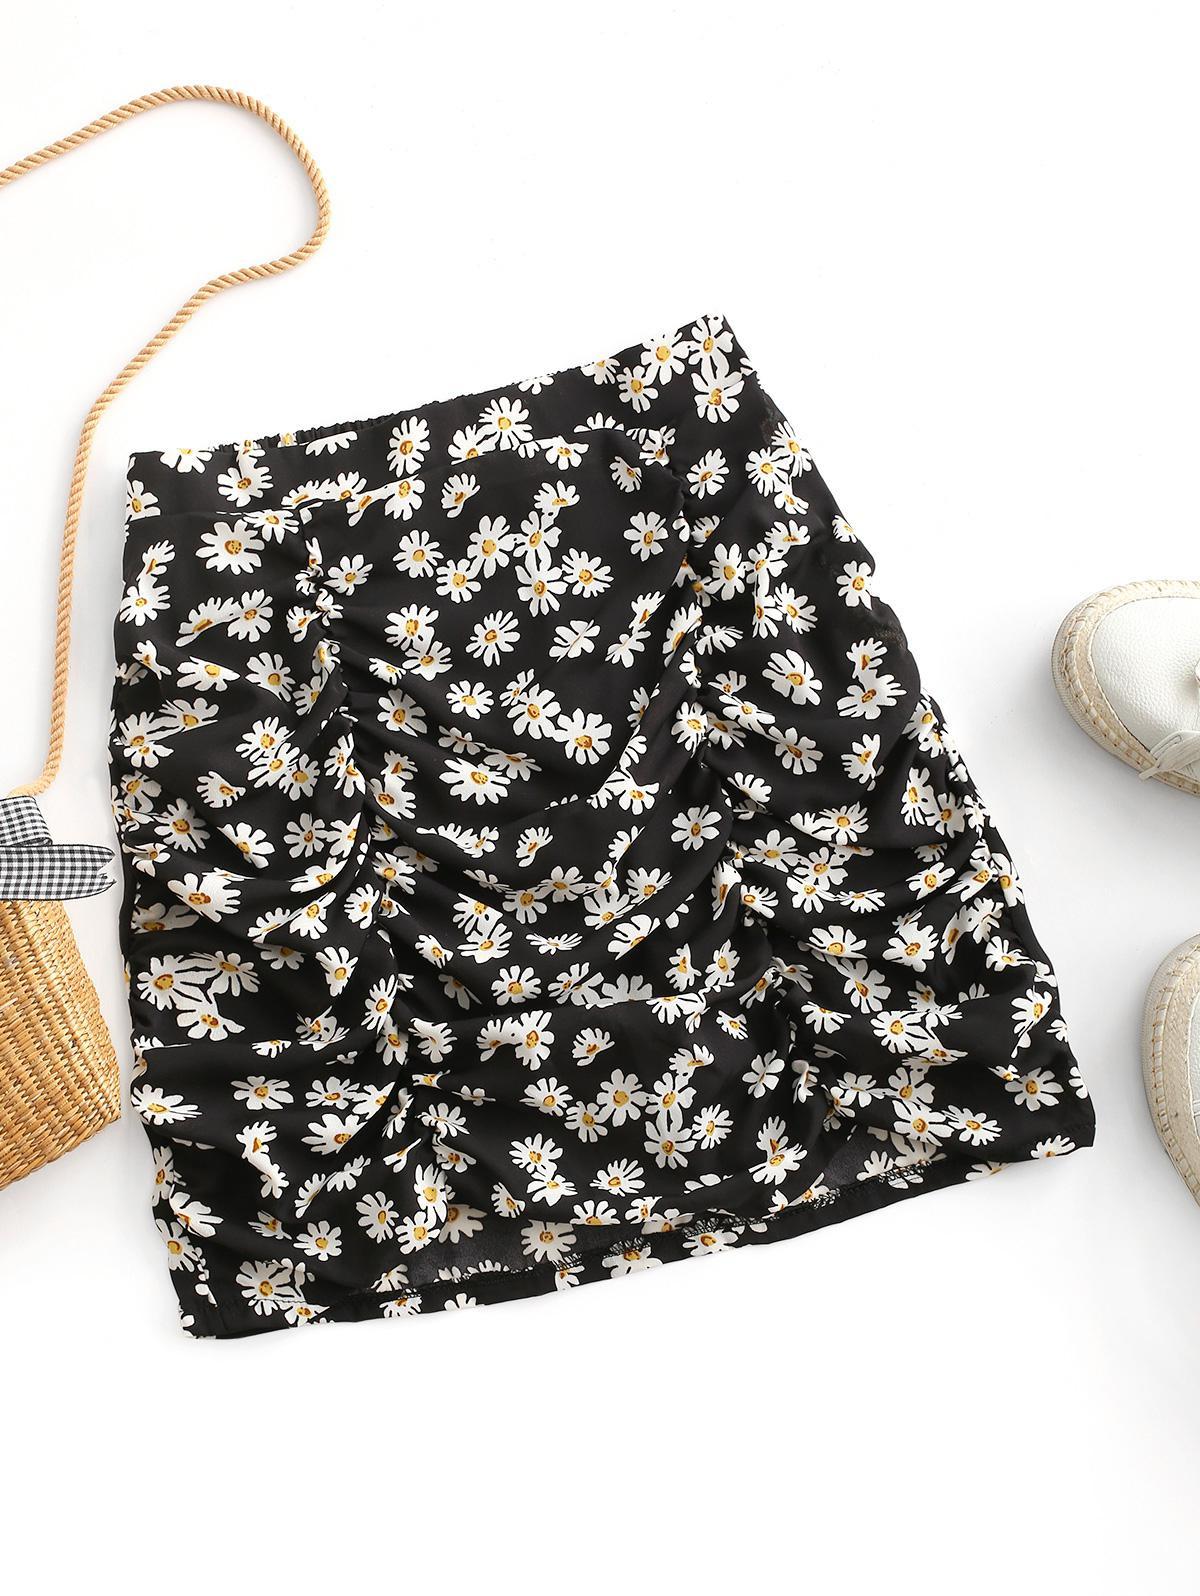 Daisy Print Ruched Mini Skirt